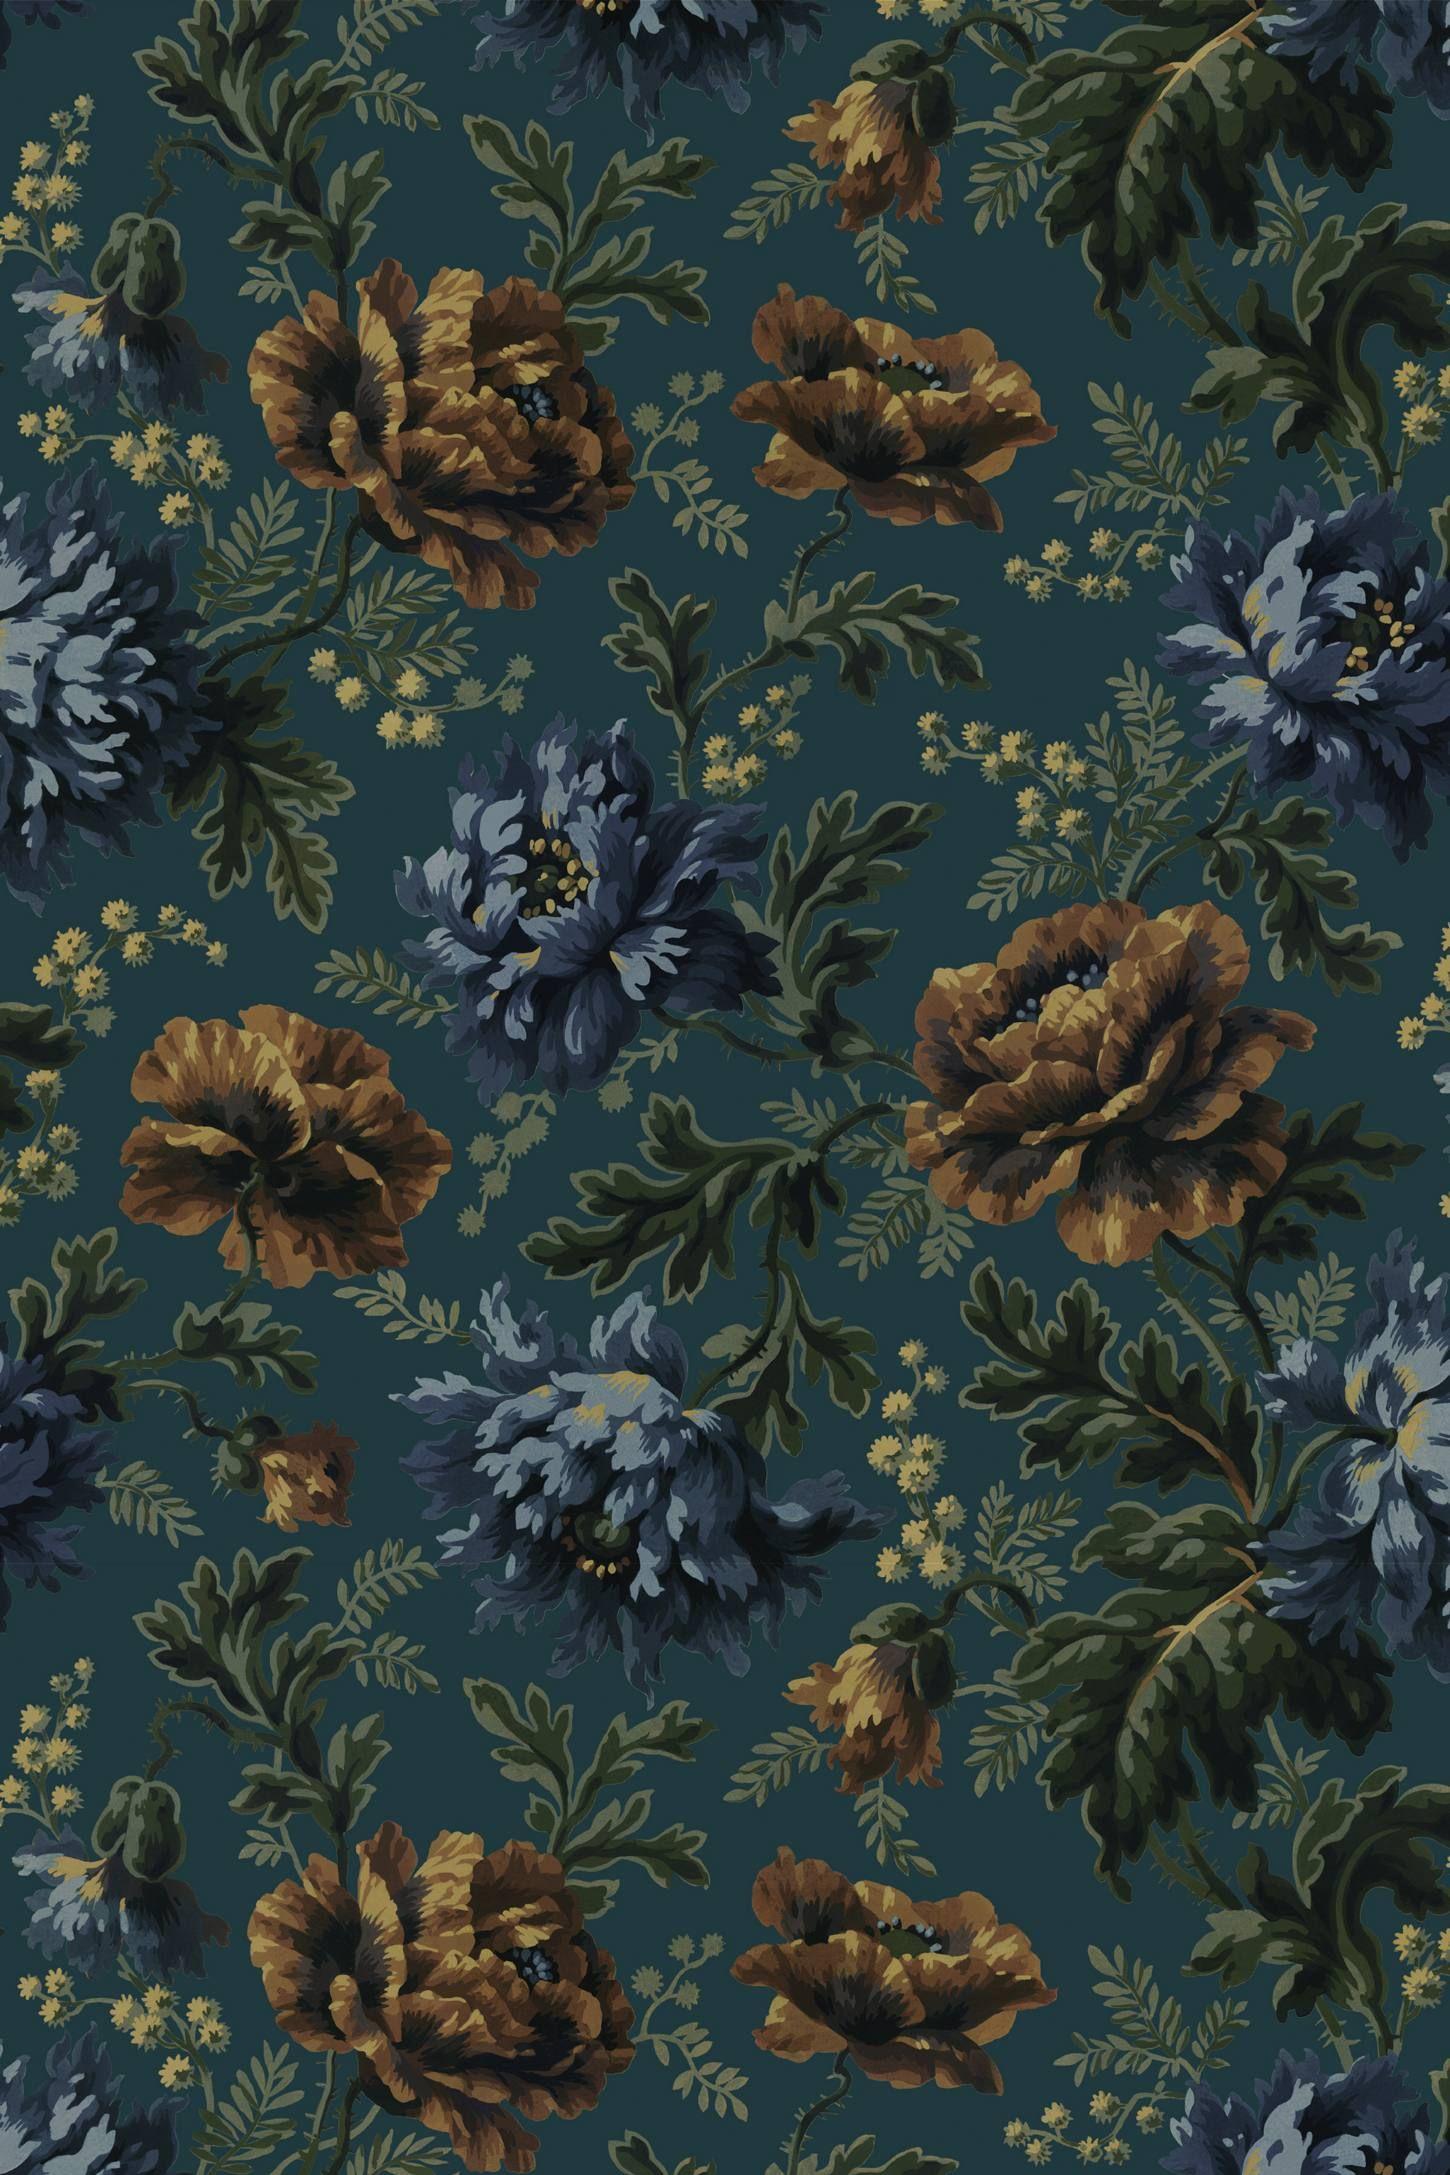 House Of Hackney Opia Wallpaper In 2021 Dark Phone Wallpapers Dark Wallpaper Victorian Wallpaper